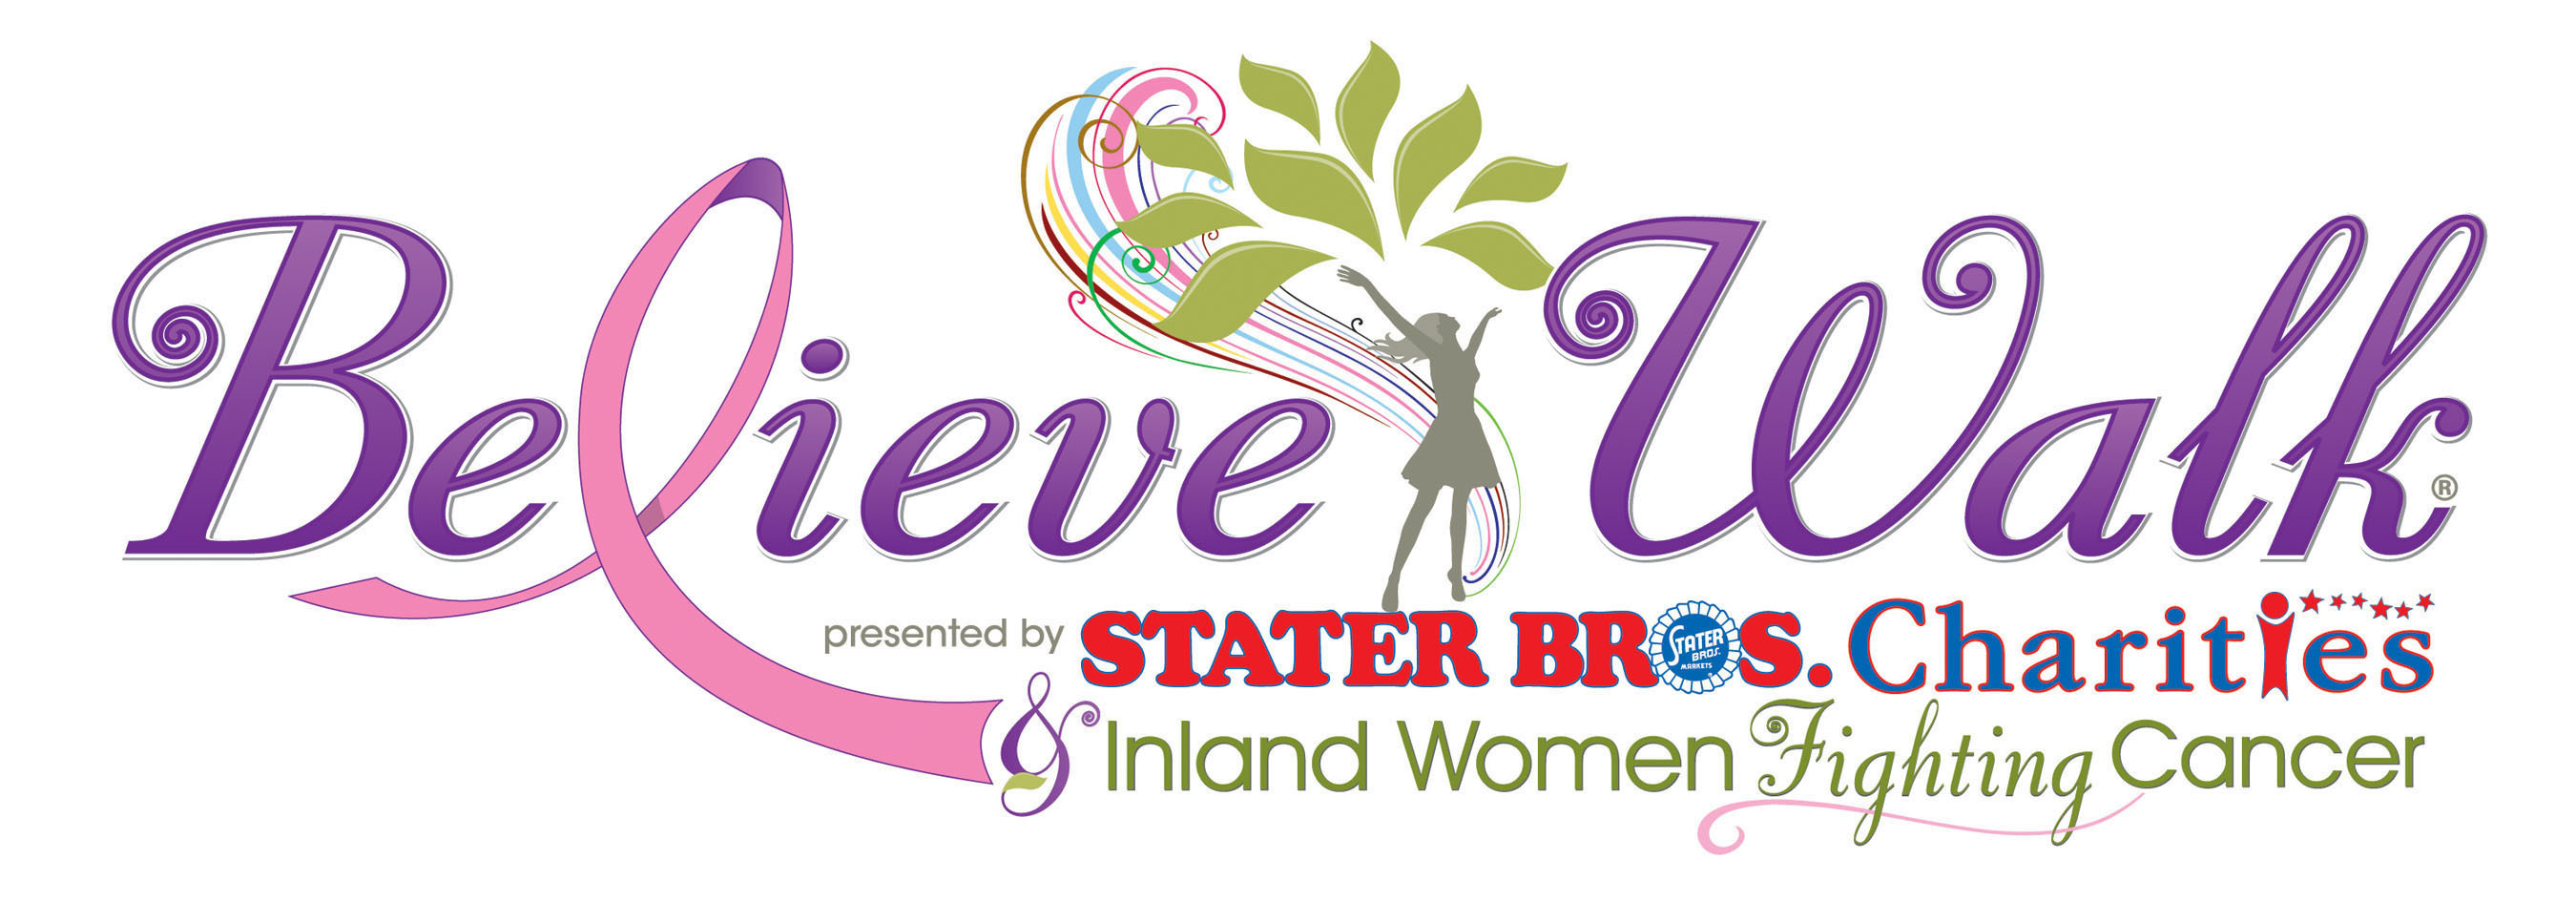 Stater Bros. Charities Logo. (PRNewsFoto/Stater Bros. Charities) (PRNewsFoto/STATER BROS. CHARITIES)